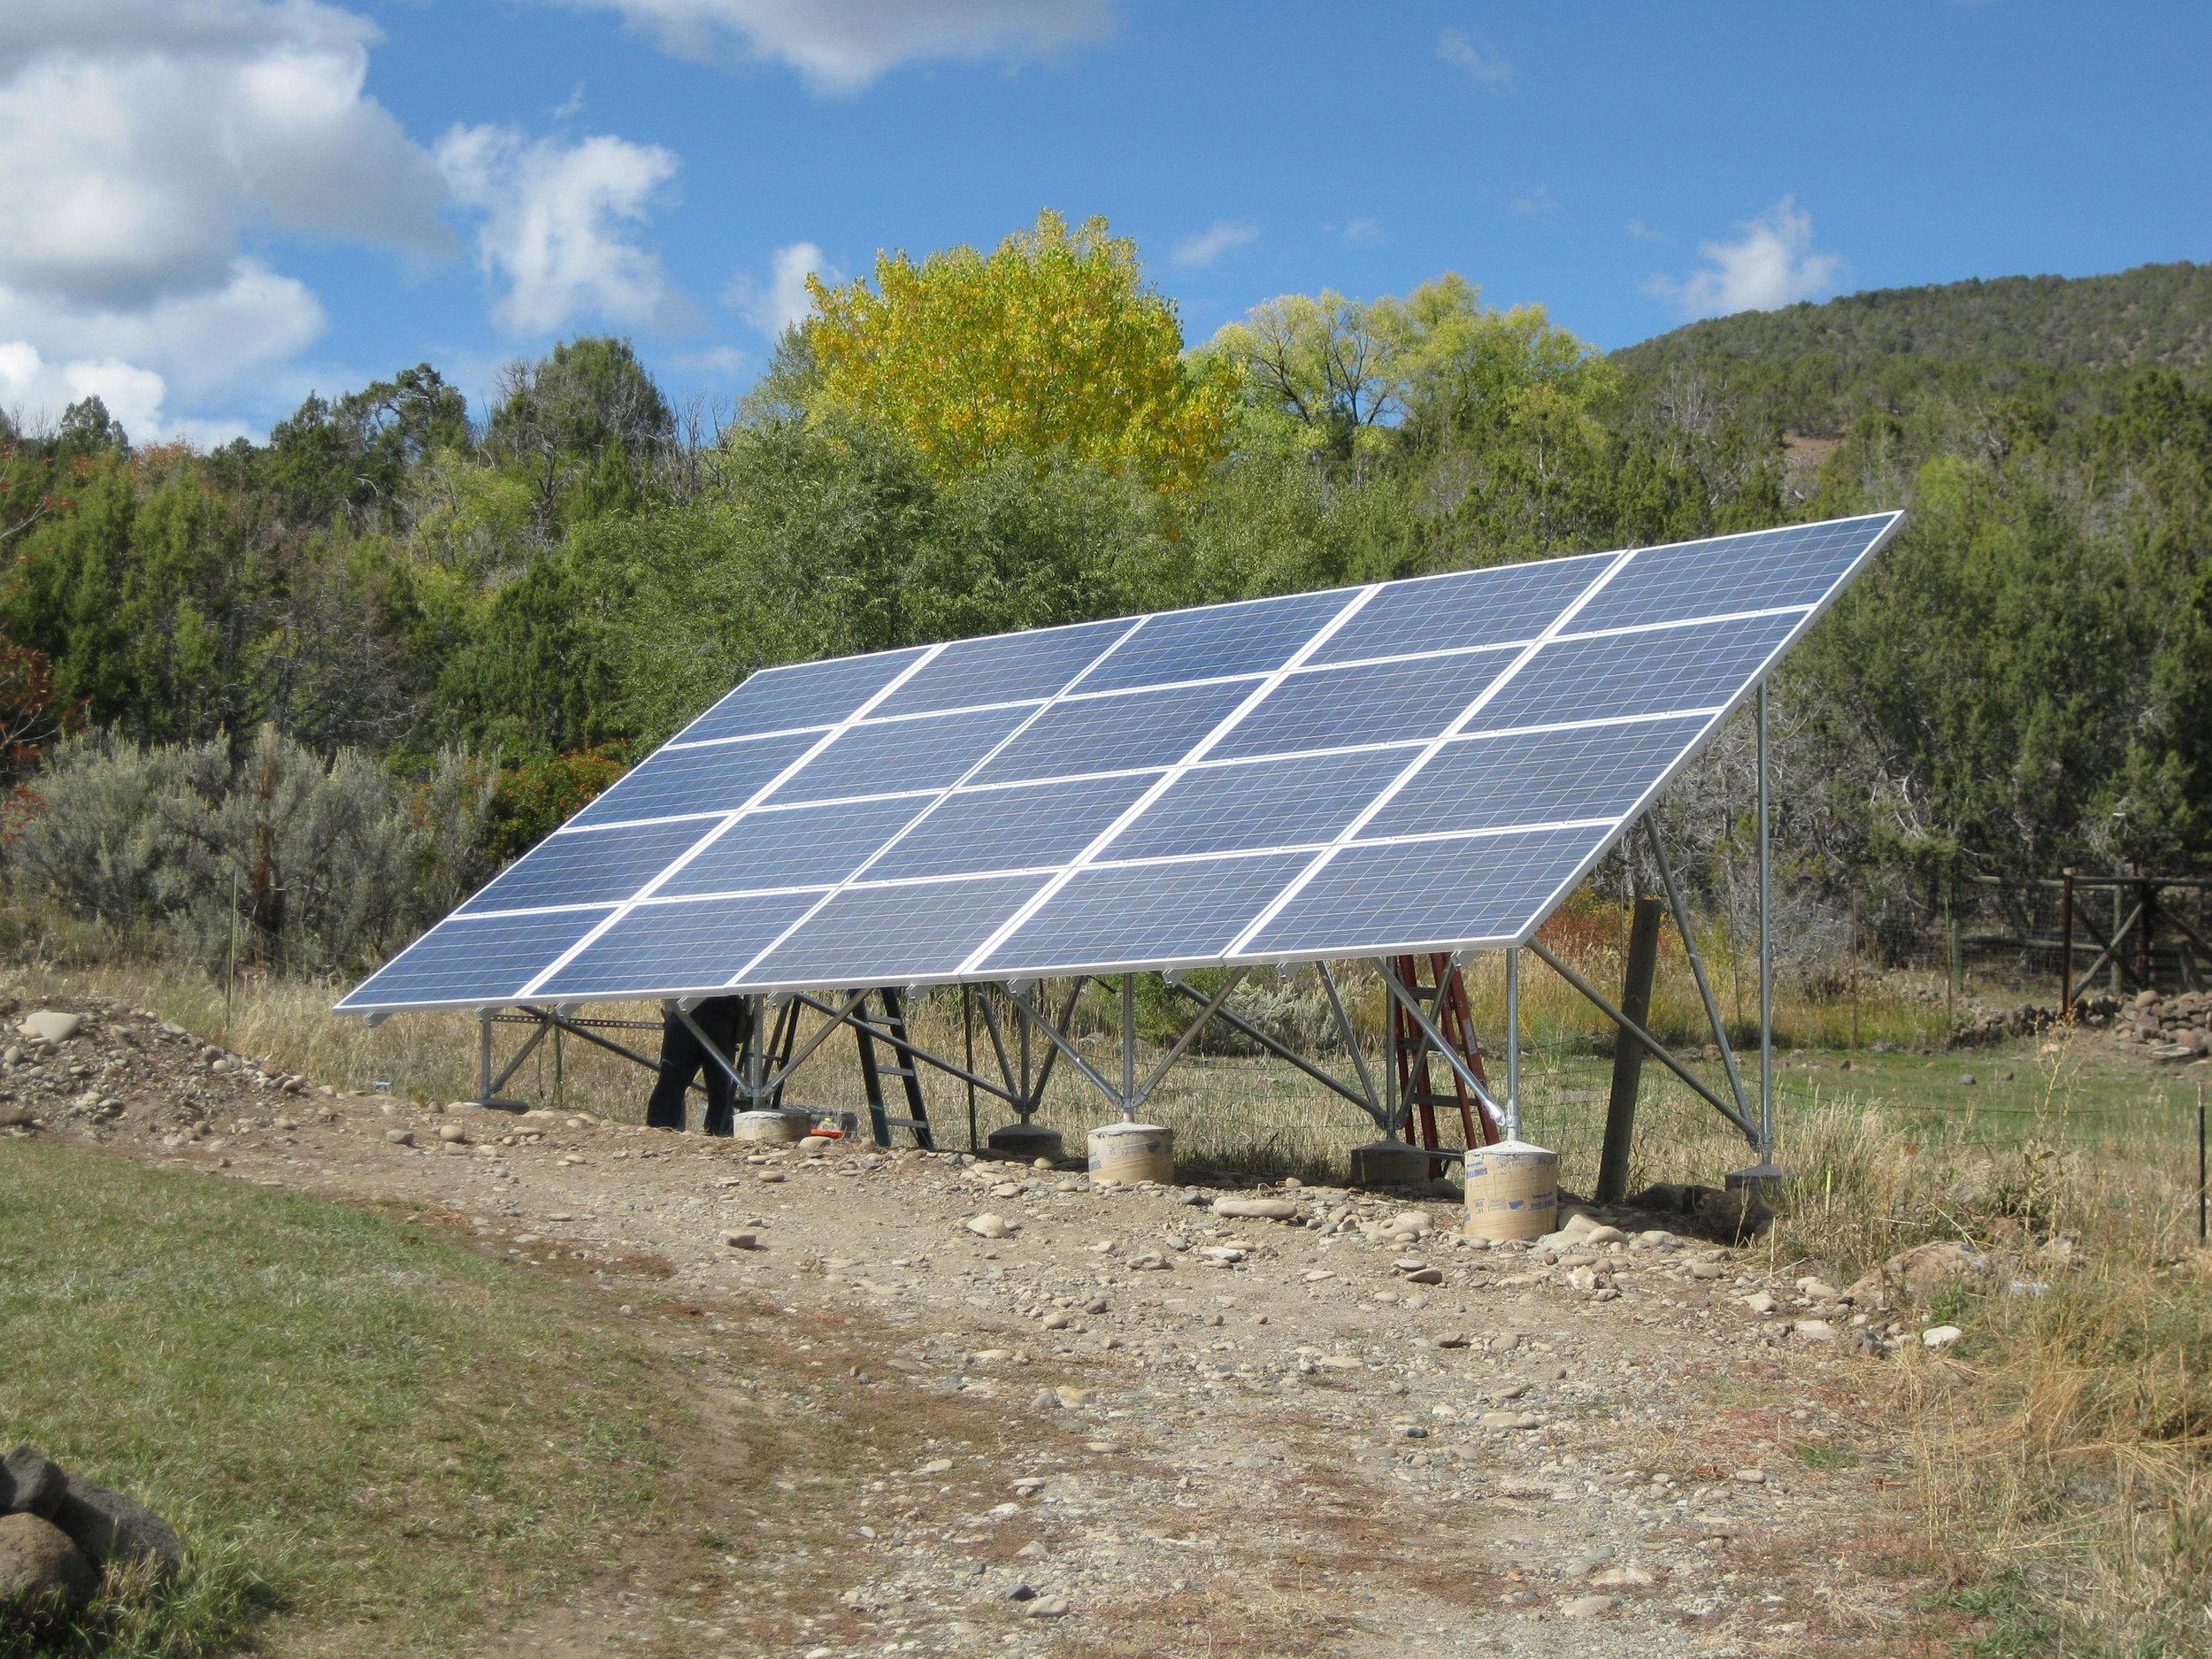 alternative-power-enterprises-solar-installation-projects17.jpg